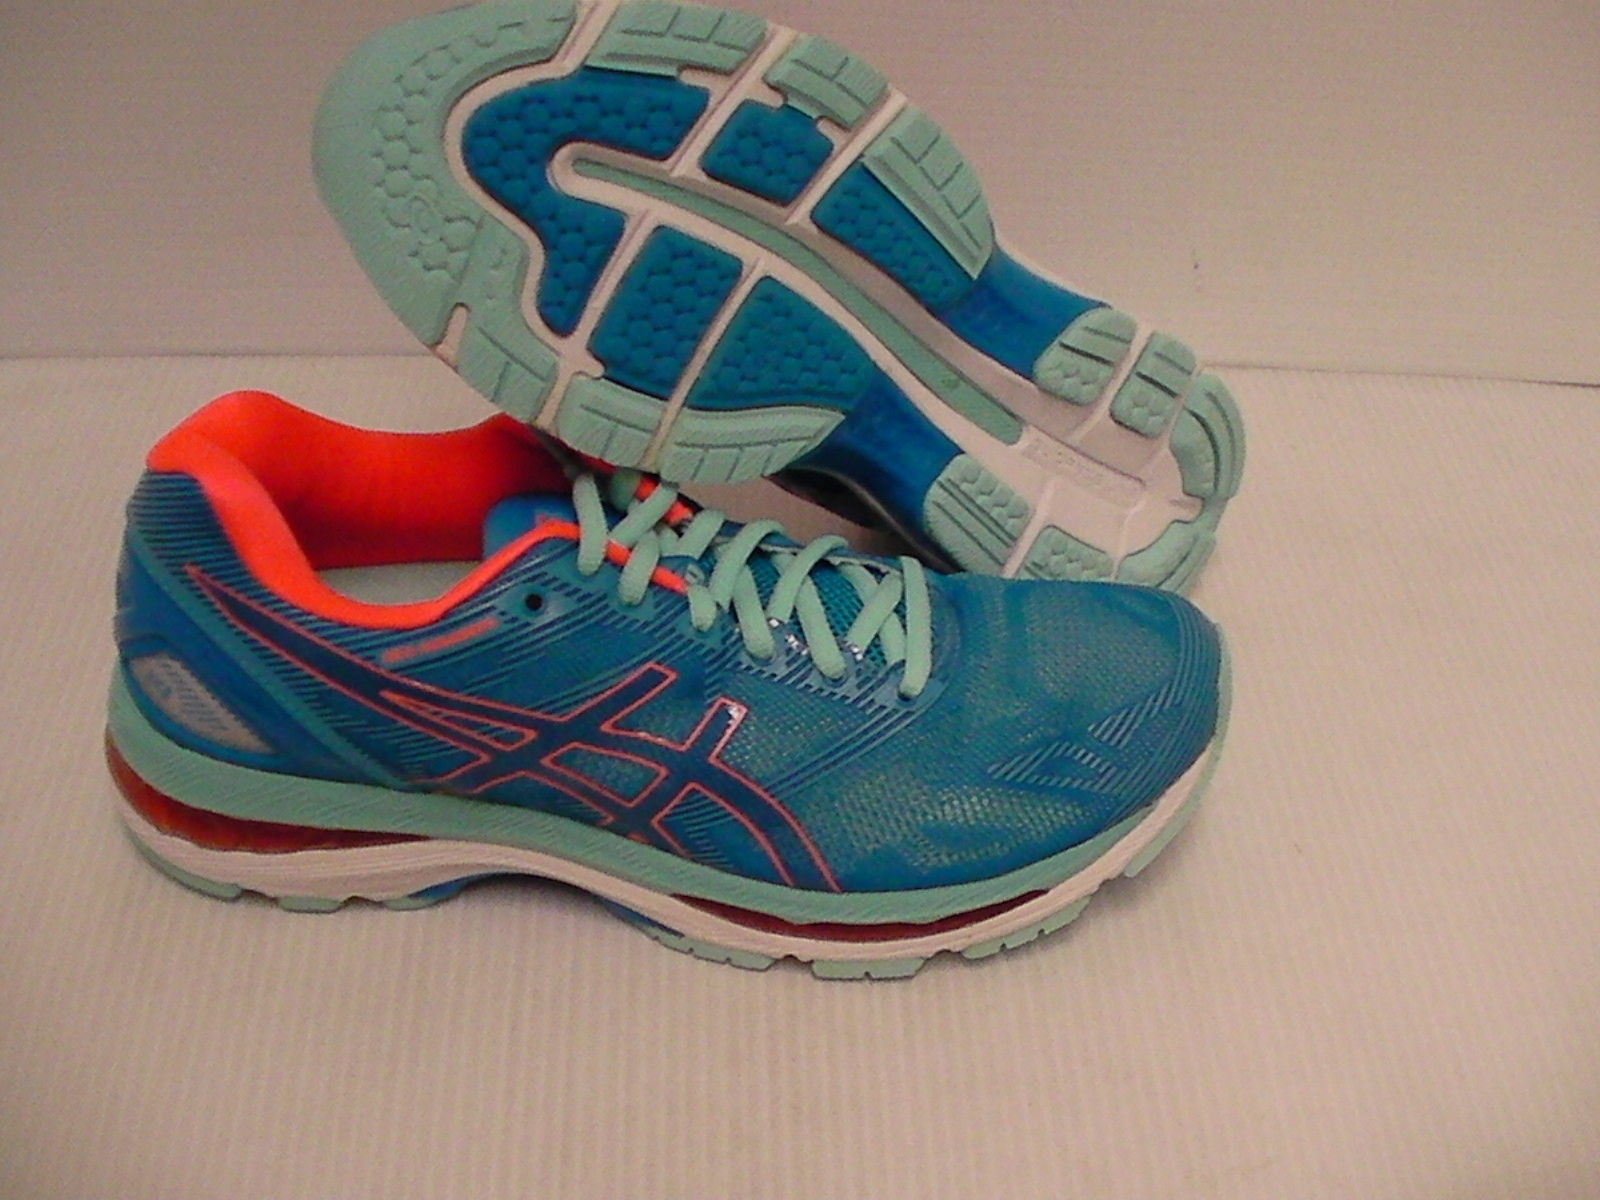 Asics women's gel nimbus 19 running shoes and 28 similar items